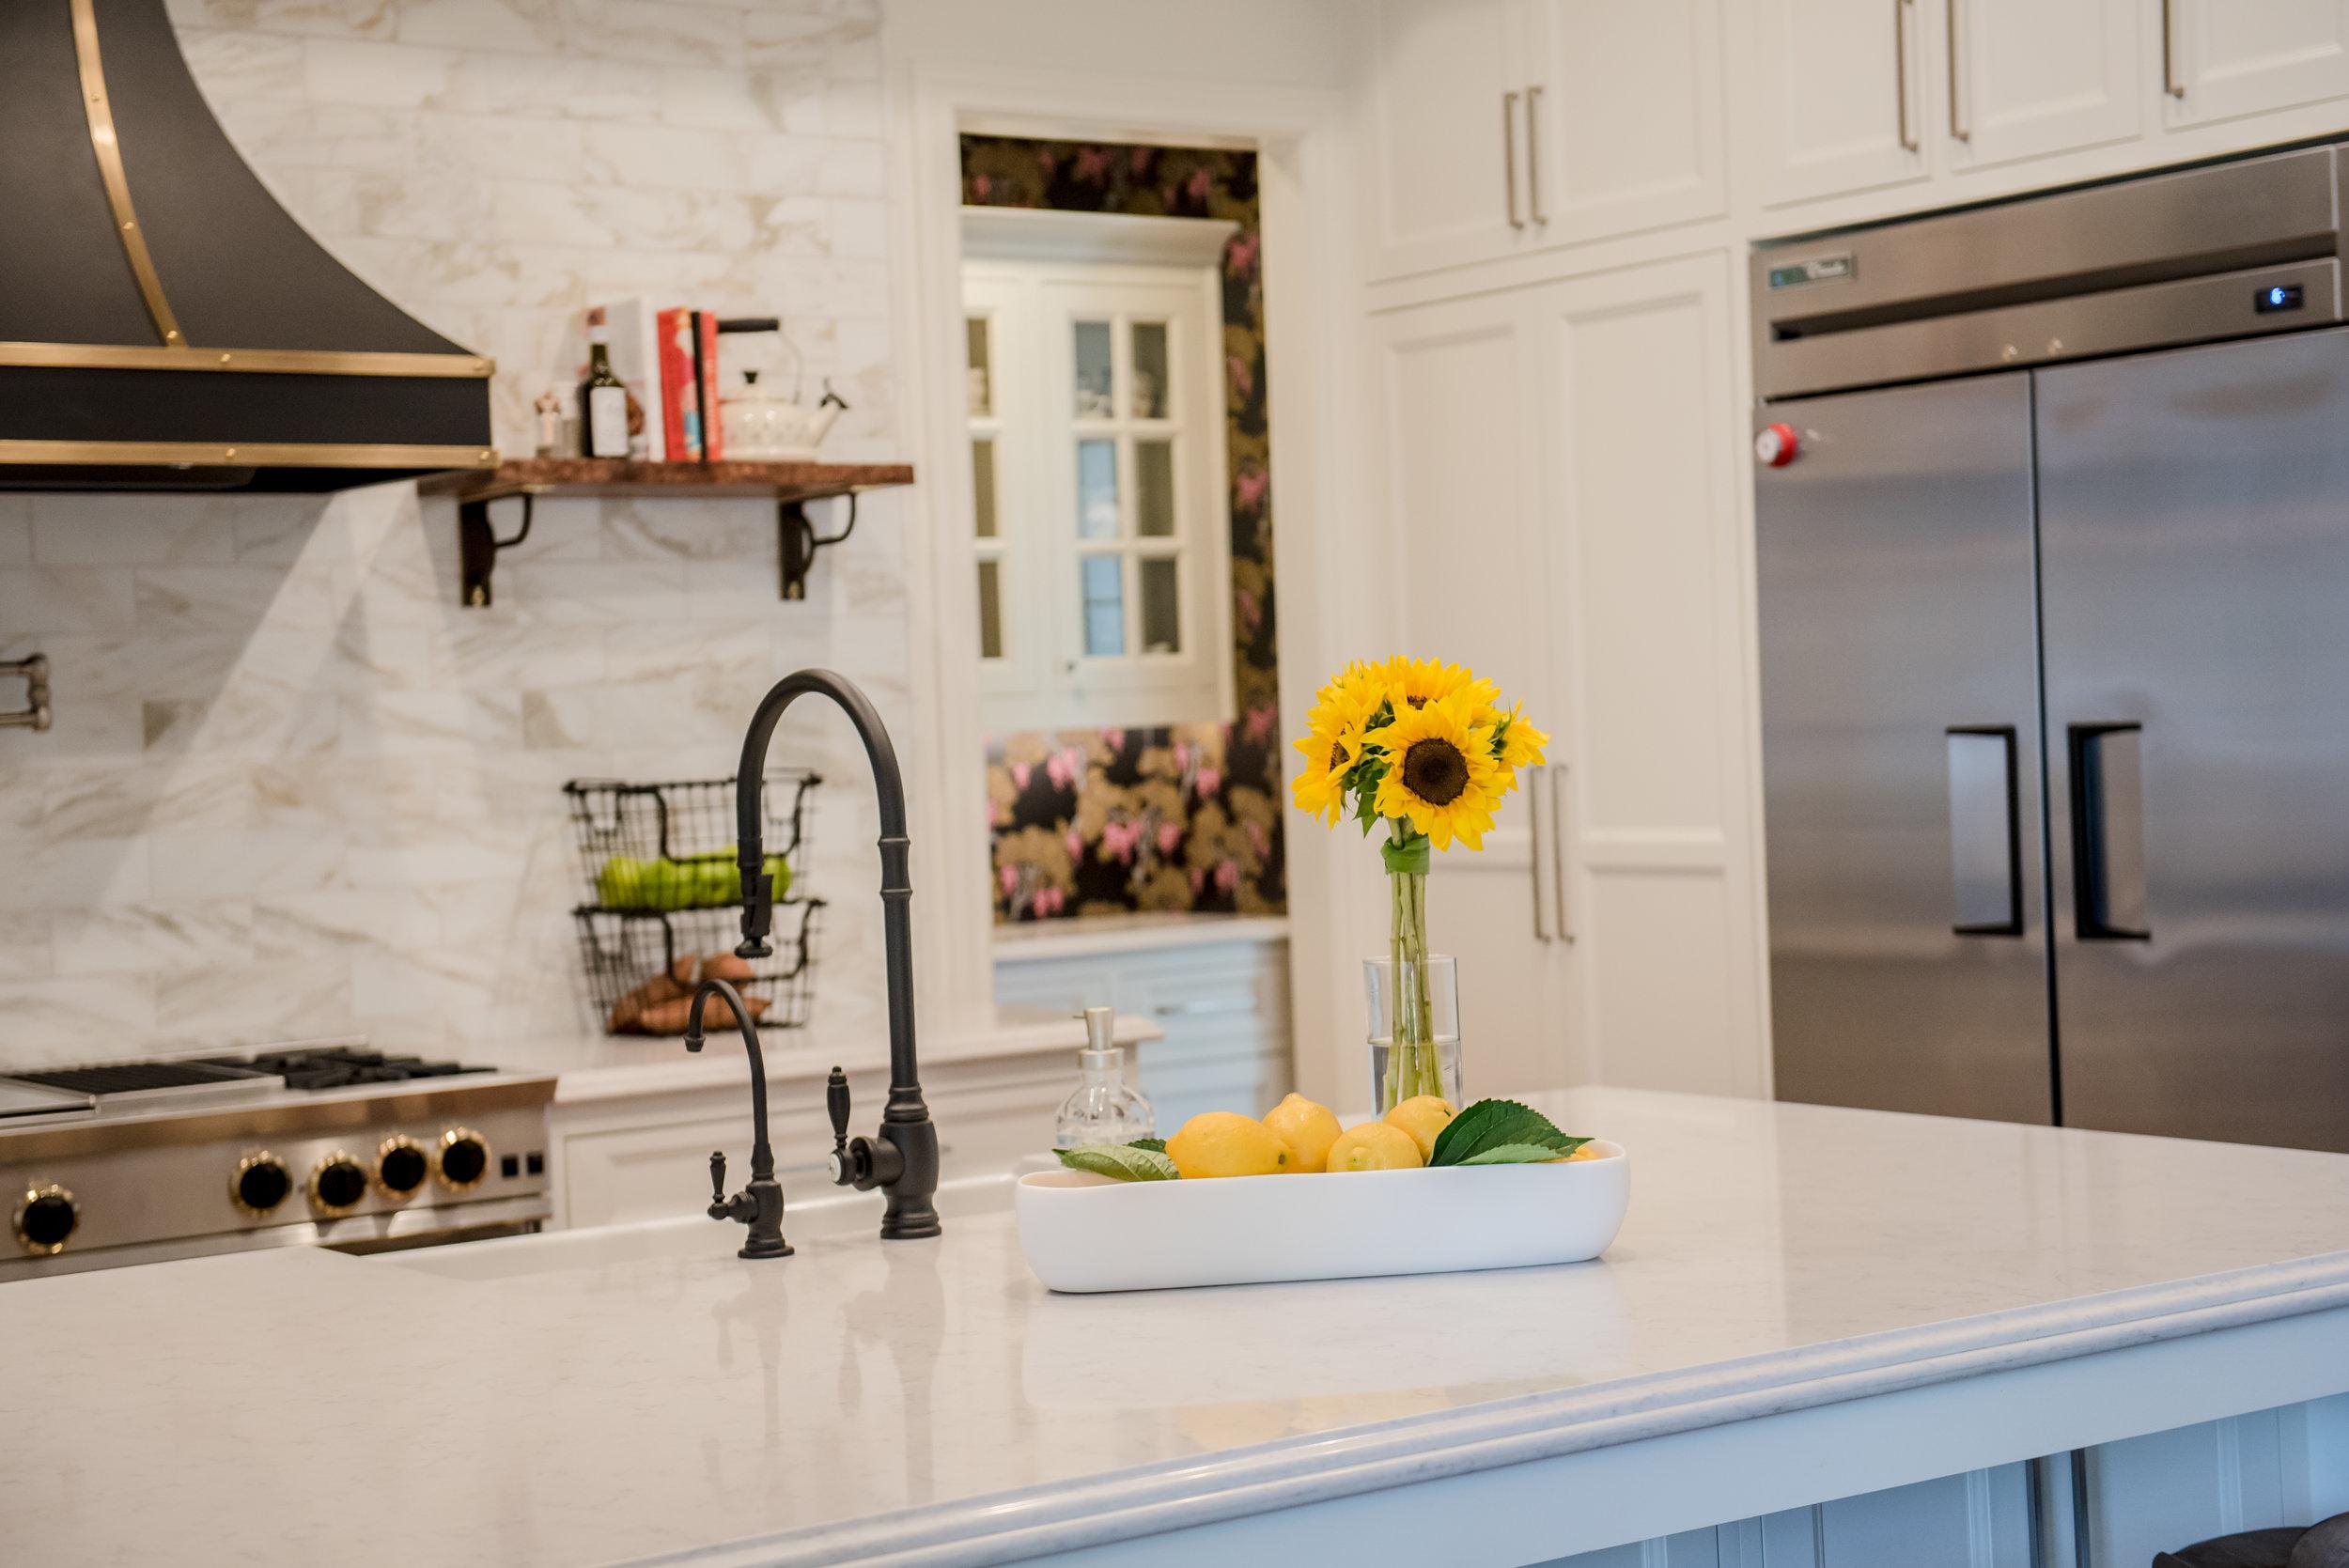 22-Kitchen+Island+Hood+Range+Openshelves+Butlers+Wallpaper.jpg